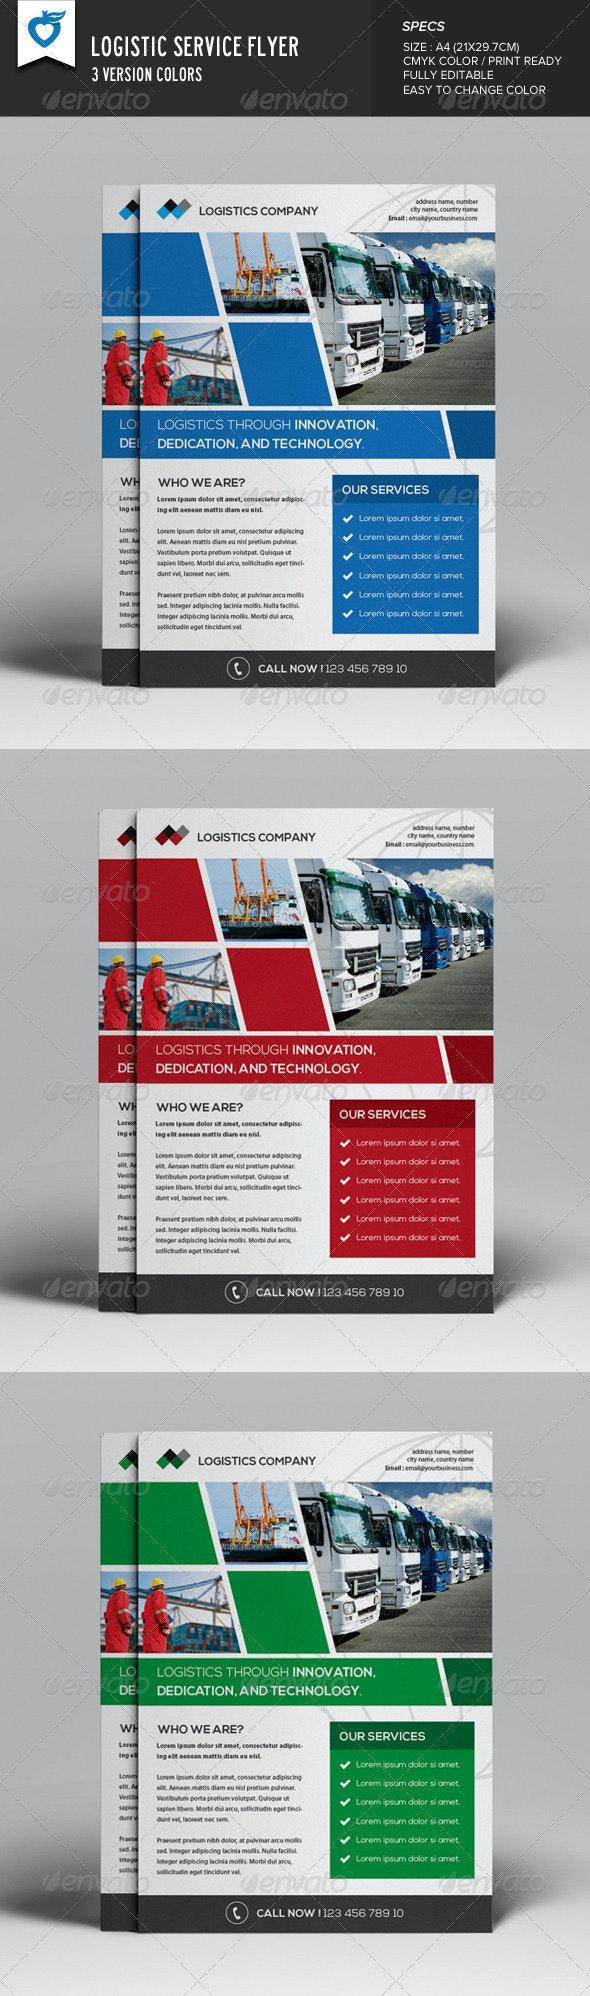 Logistics Flyer - Corporate Flyers